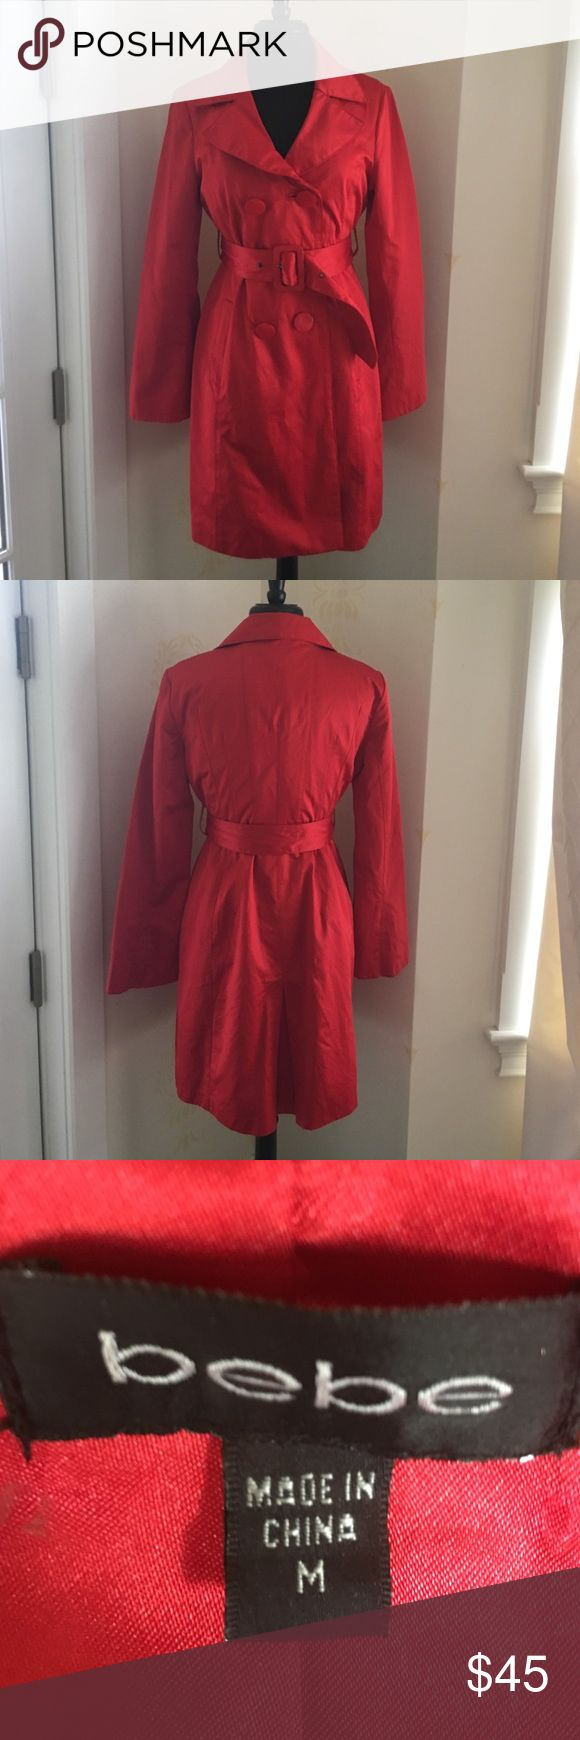 Fire engine red Bebe rain coat Fire engine red Bebe rain coat. Lightly used beautiful slimming fit. bebe Jackets & Coats Trench Coats